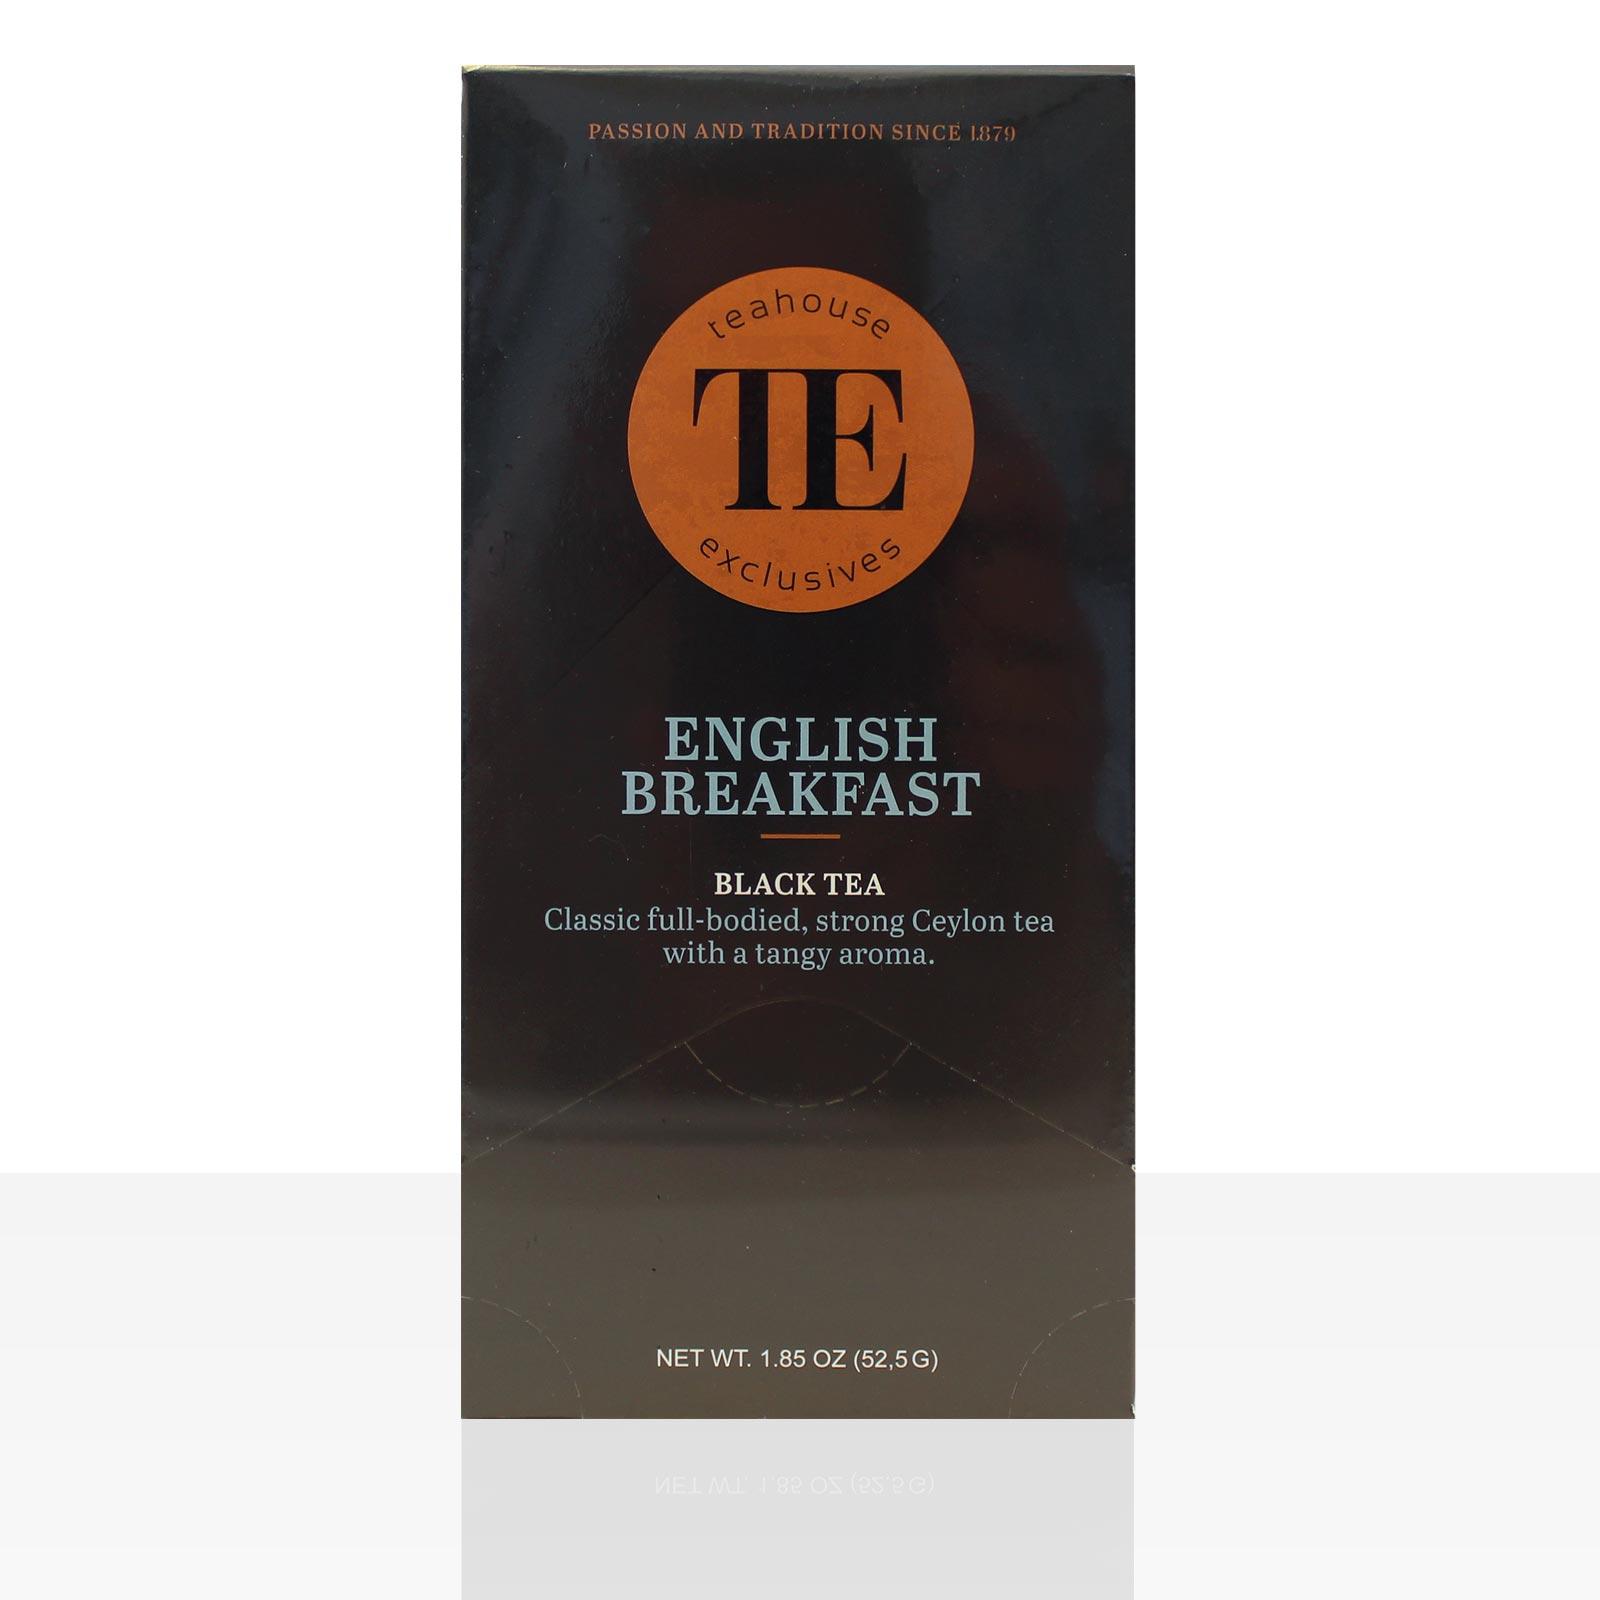 TE Luxury Teahouse Exclusive English Breakfast 15 x 3,5g Tee